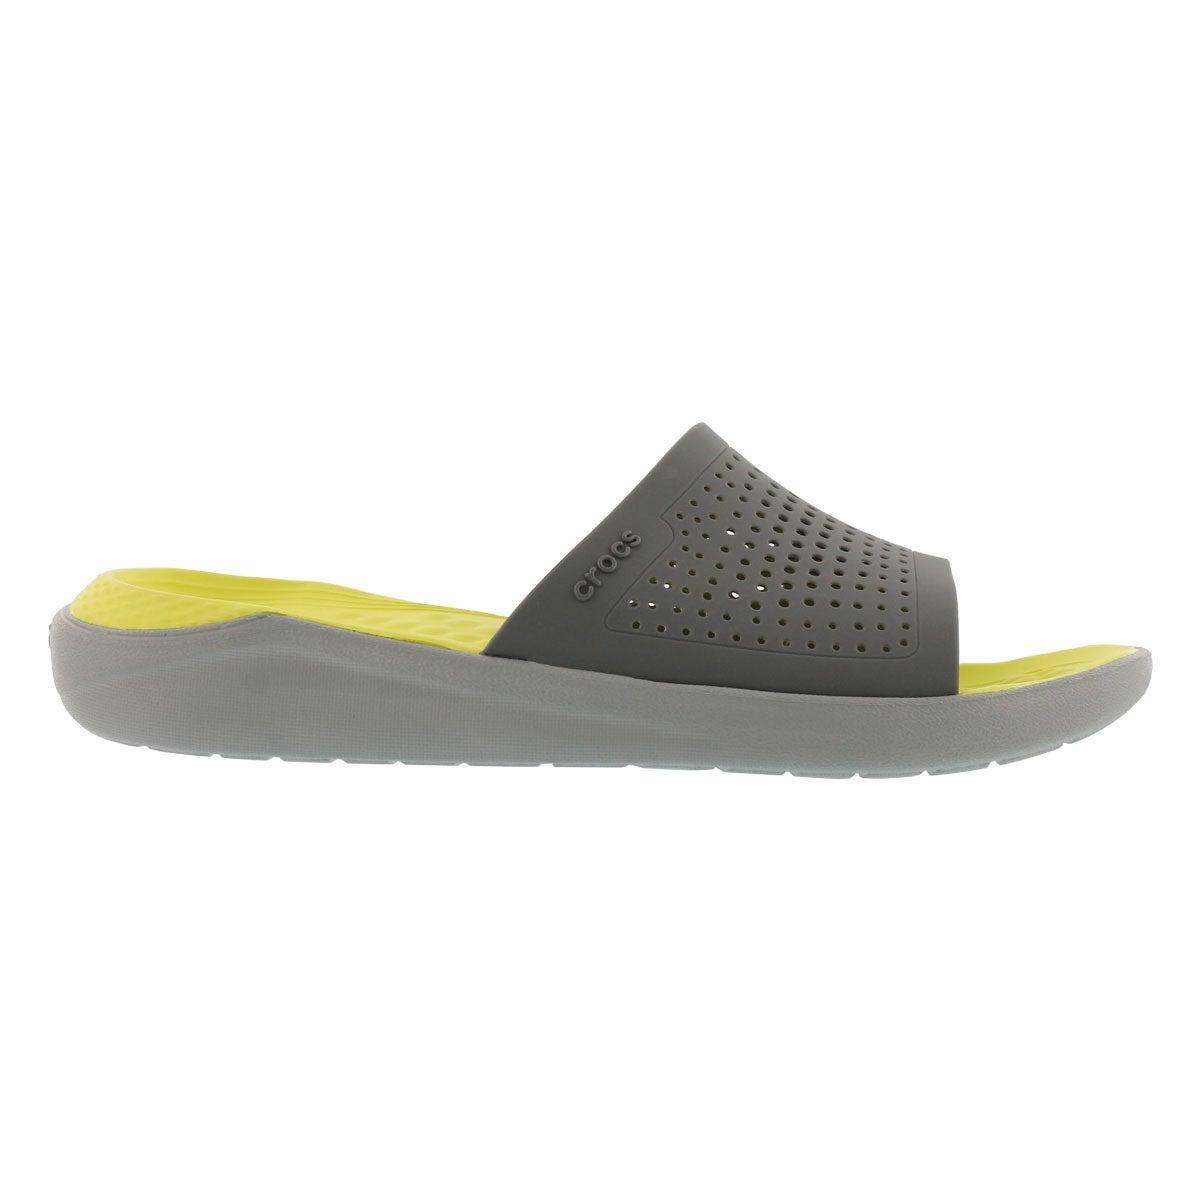 Mns LiteRide grey slide sandal